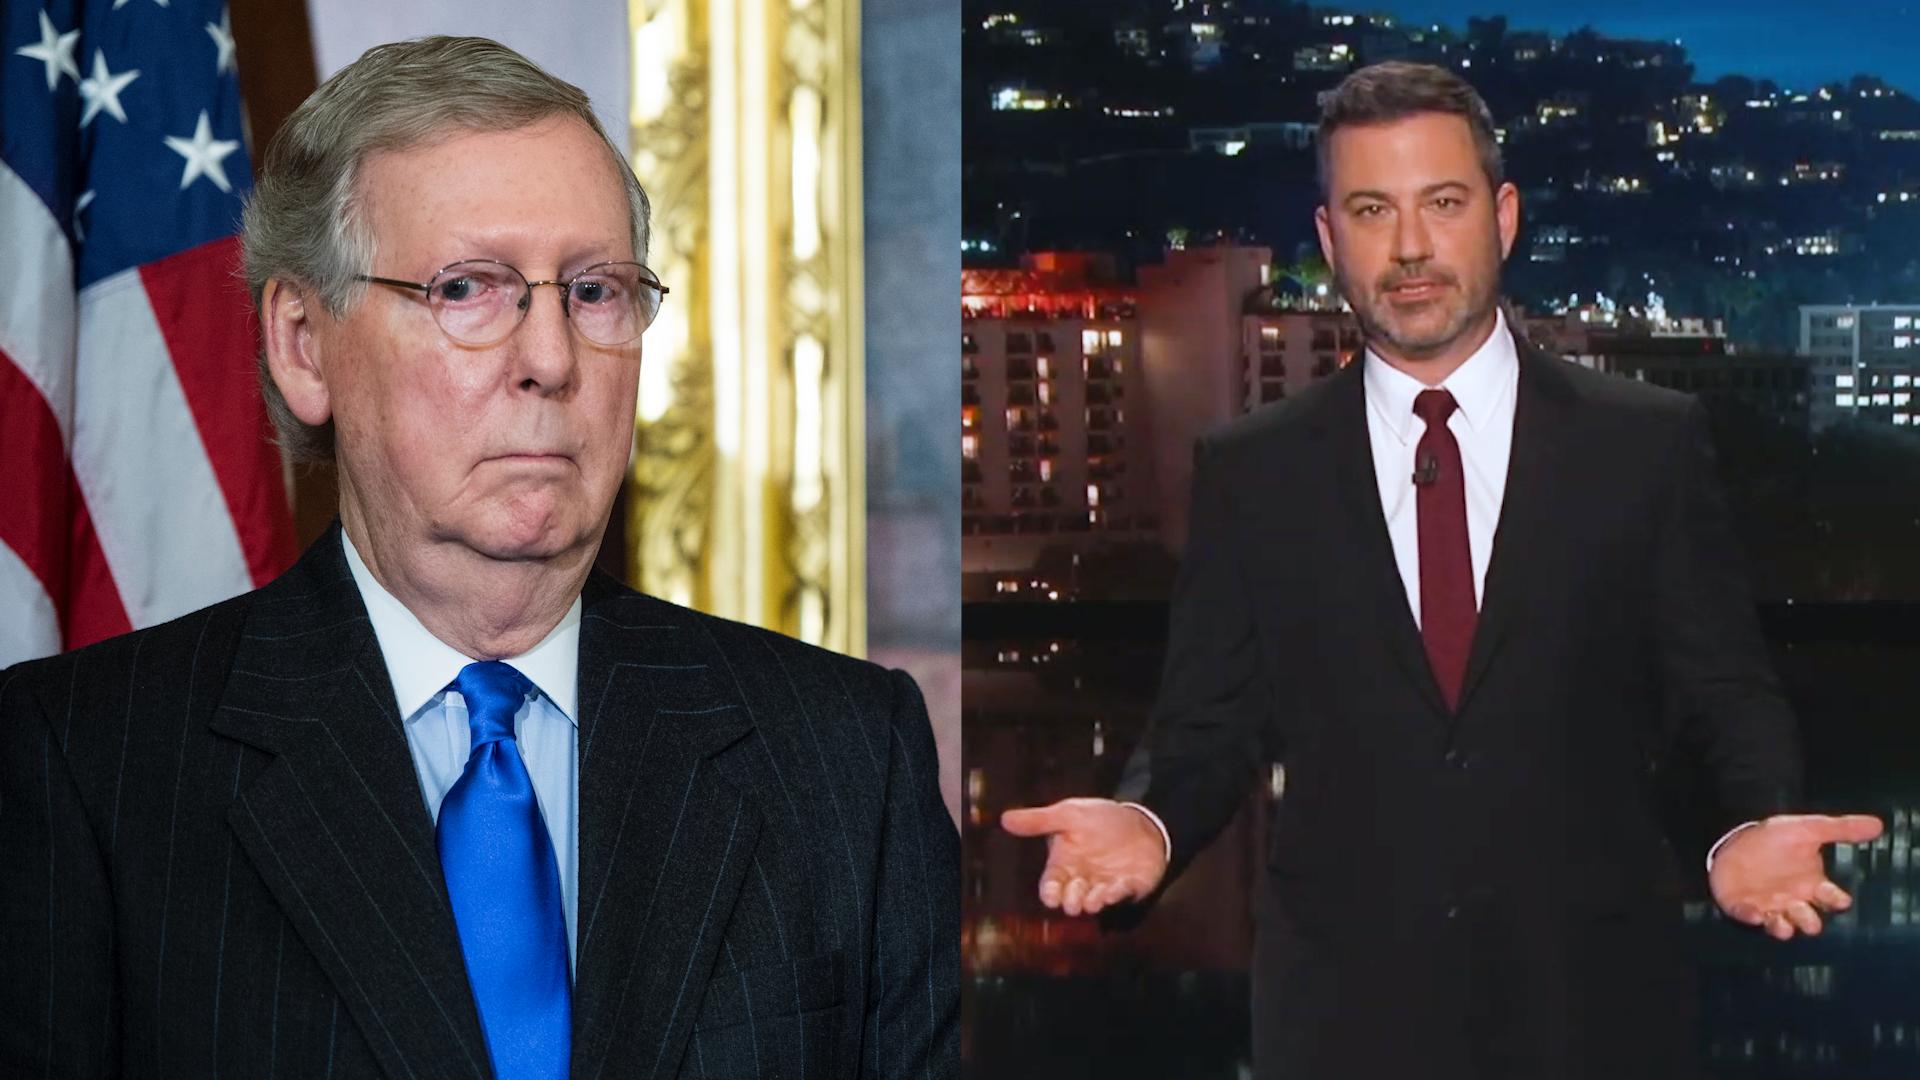 Jimmy Kimmel puts Mitch McConnell on blast for blocking vote on bipartisan  gun bill